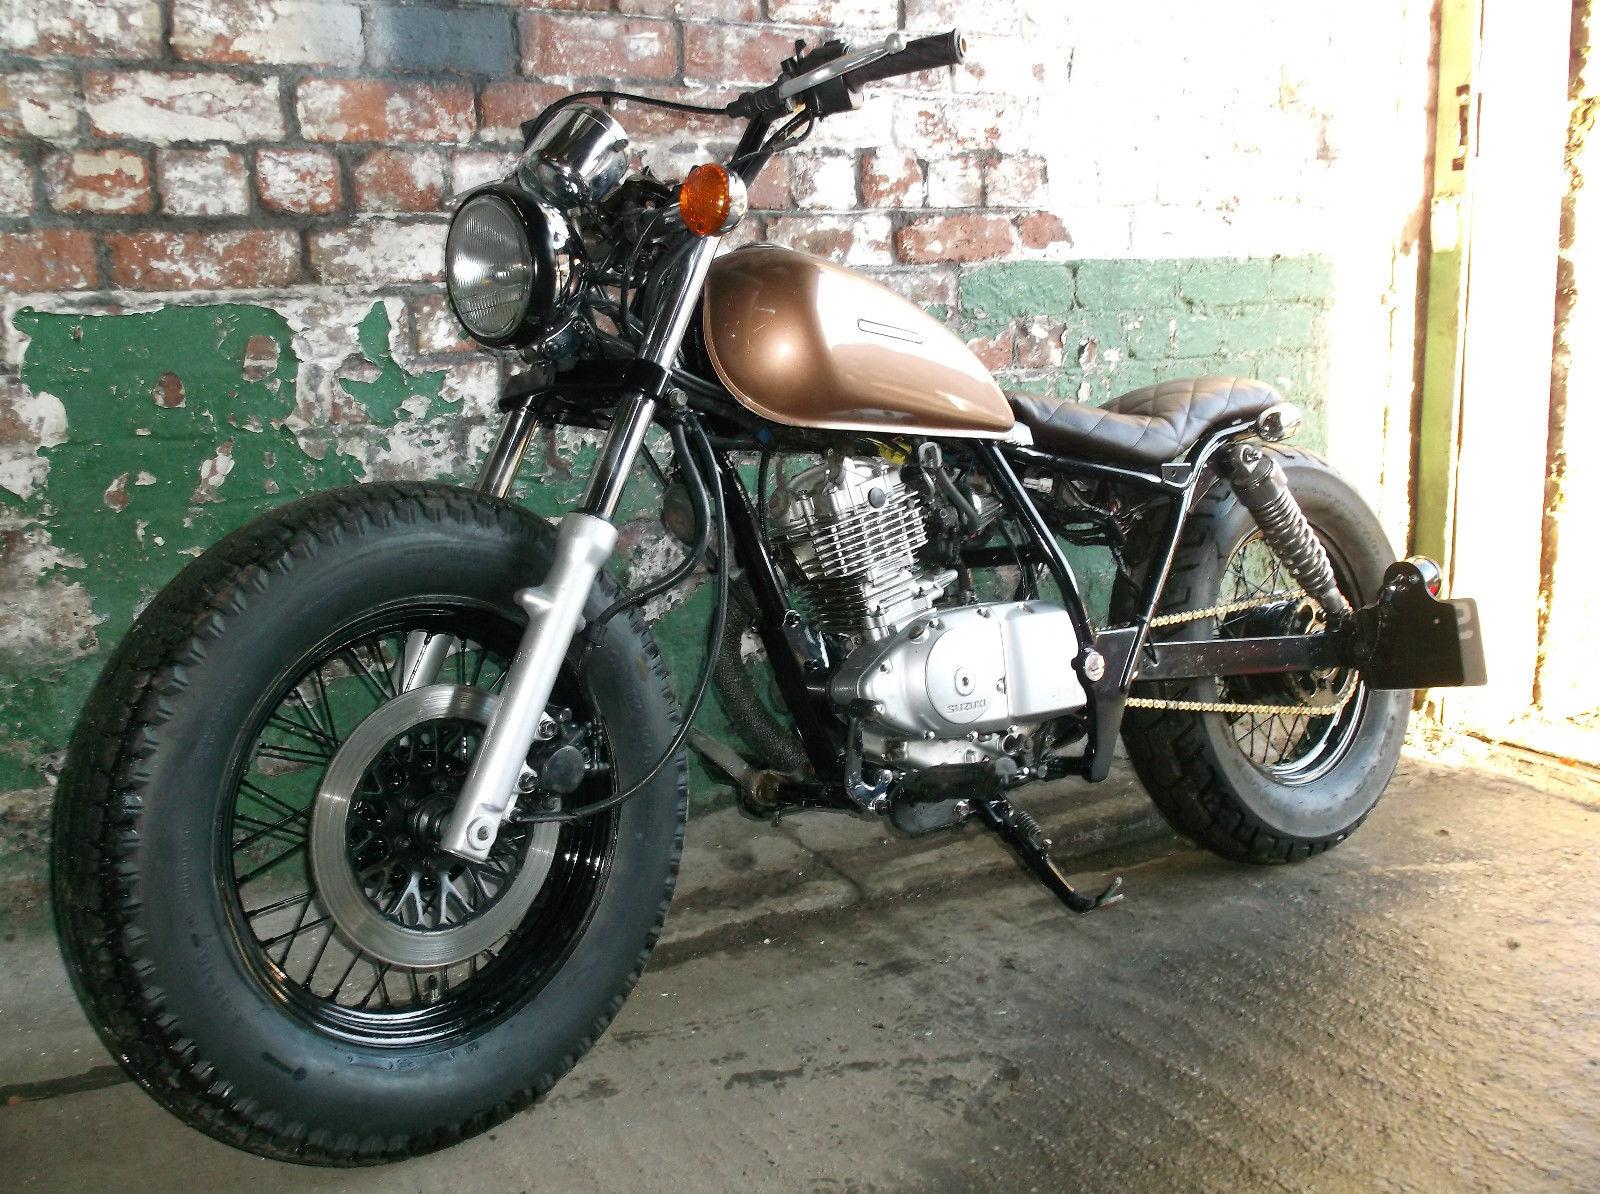 suzuki marauder gz gn 125 custom bobber tracker motorcycle 12 suzuki marauder gz gn 125 custom bobber tracker motorcycle